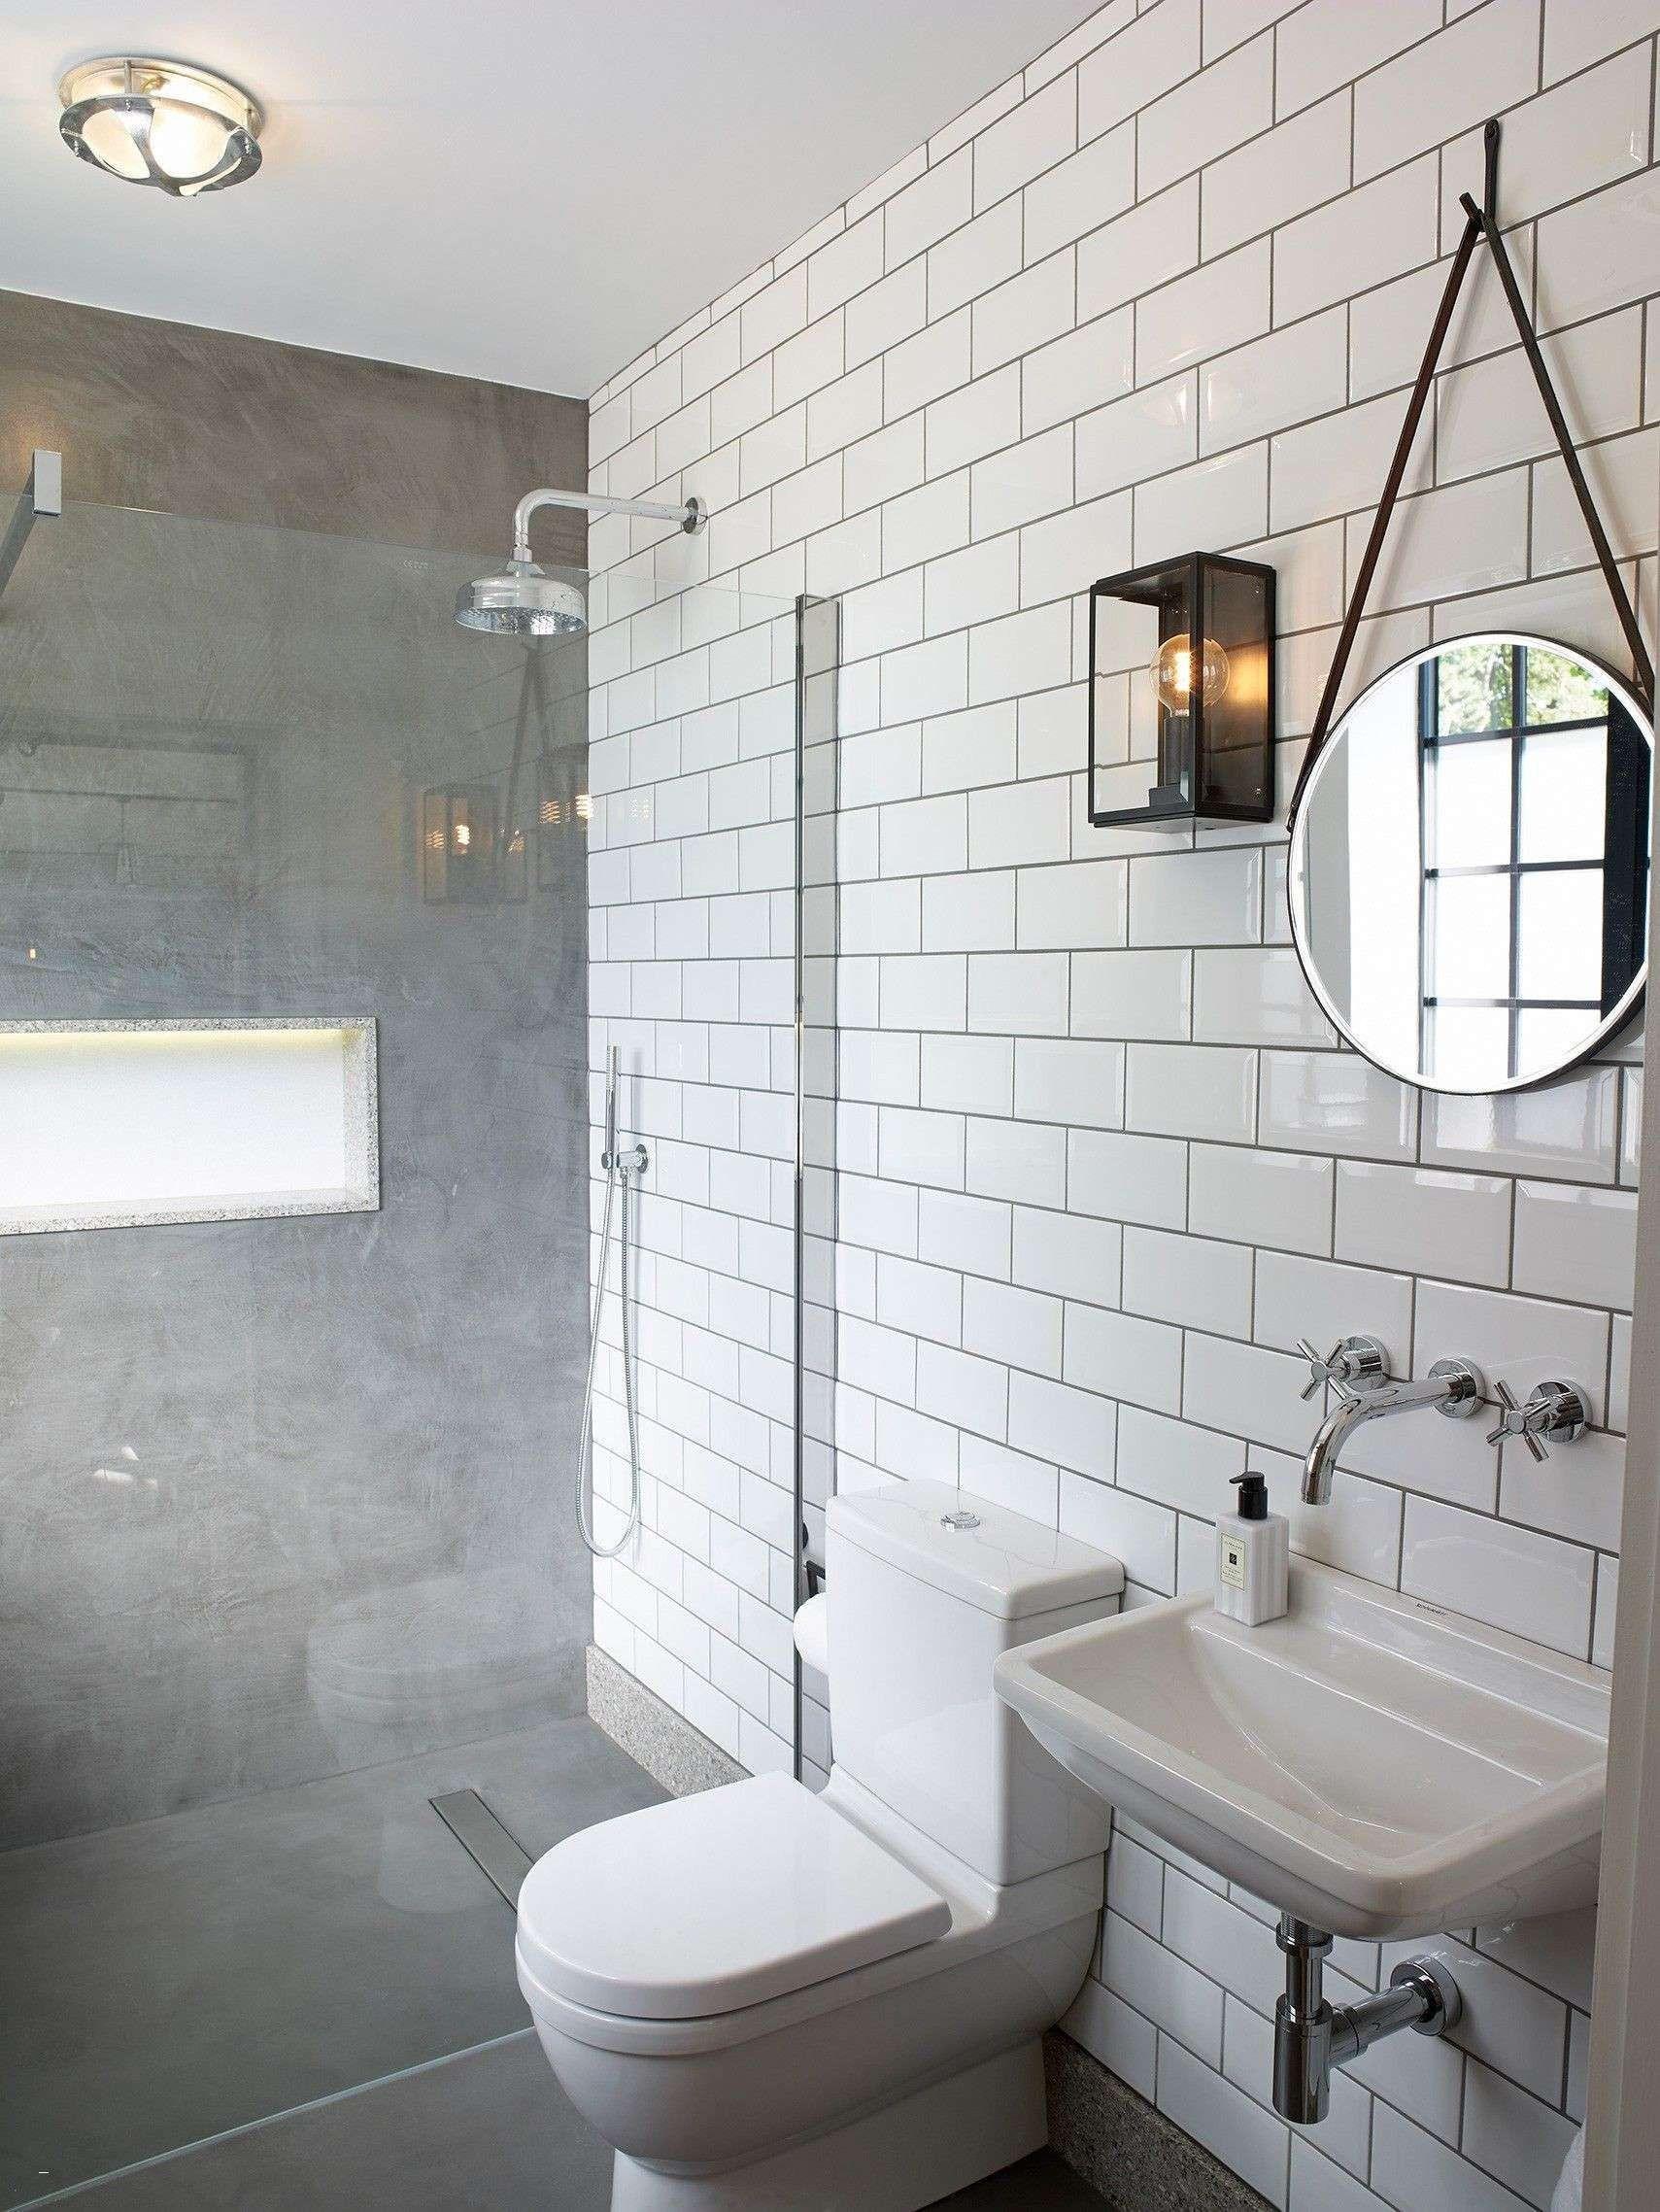 Bathroom Renovation Colour Ideas Bathroom Layout Bathrooms Remodel Home Depot Bathroom